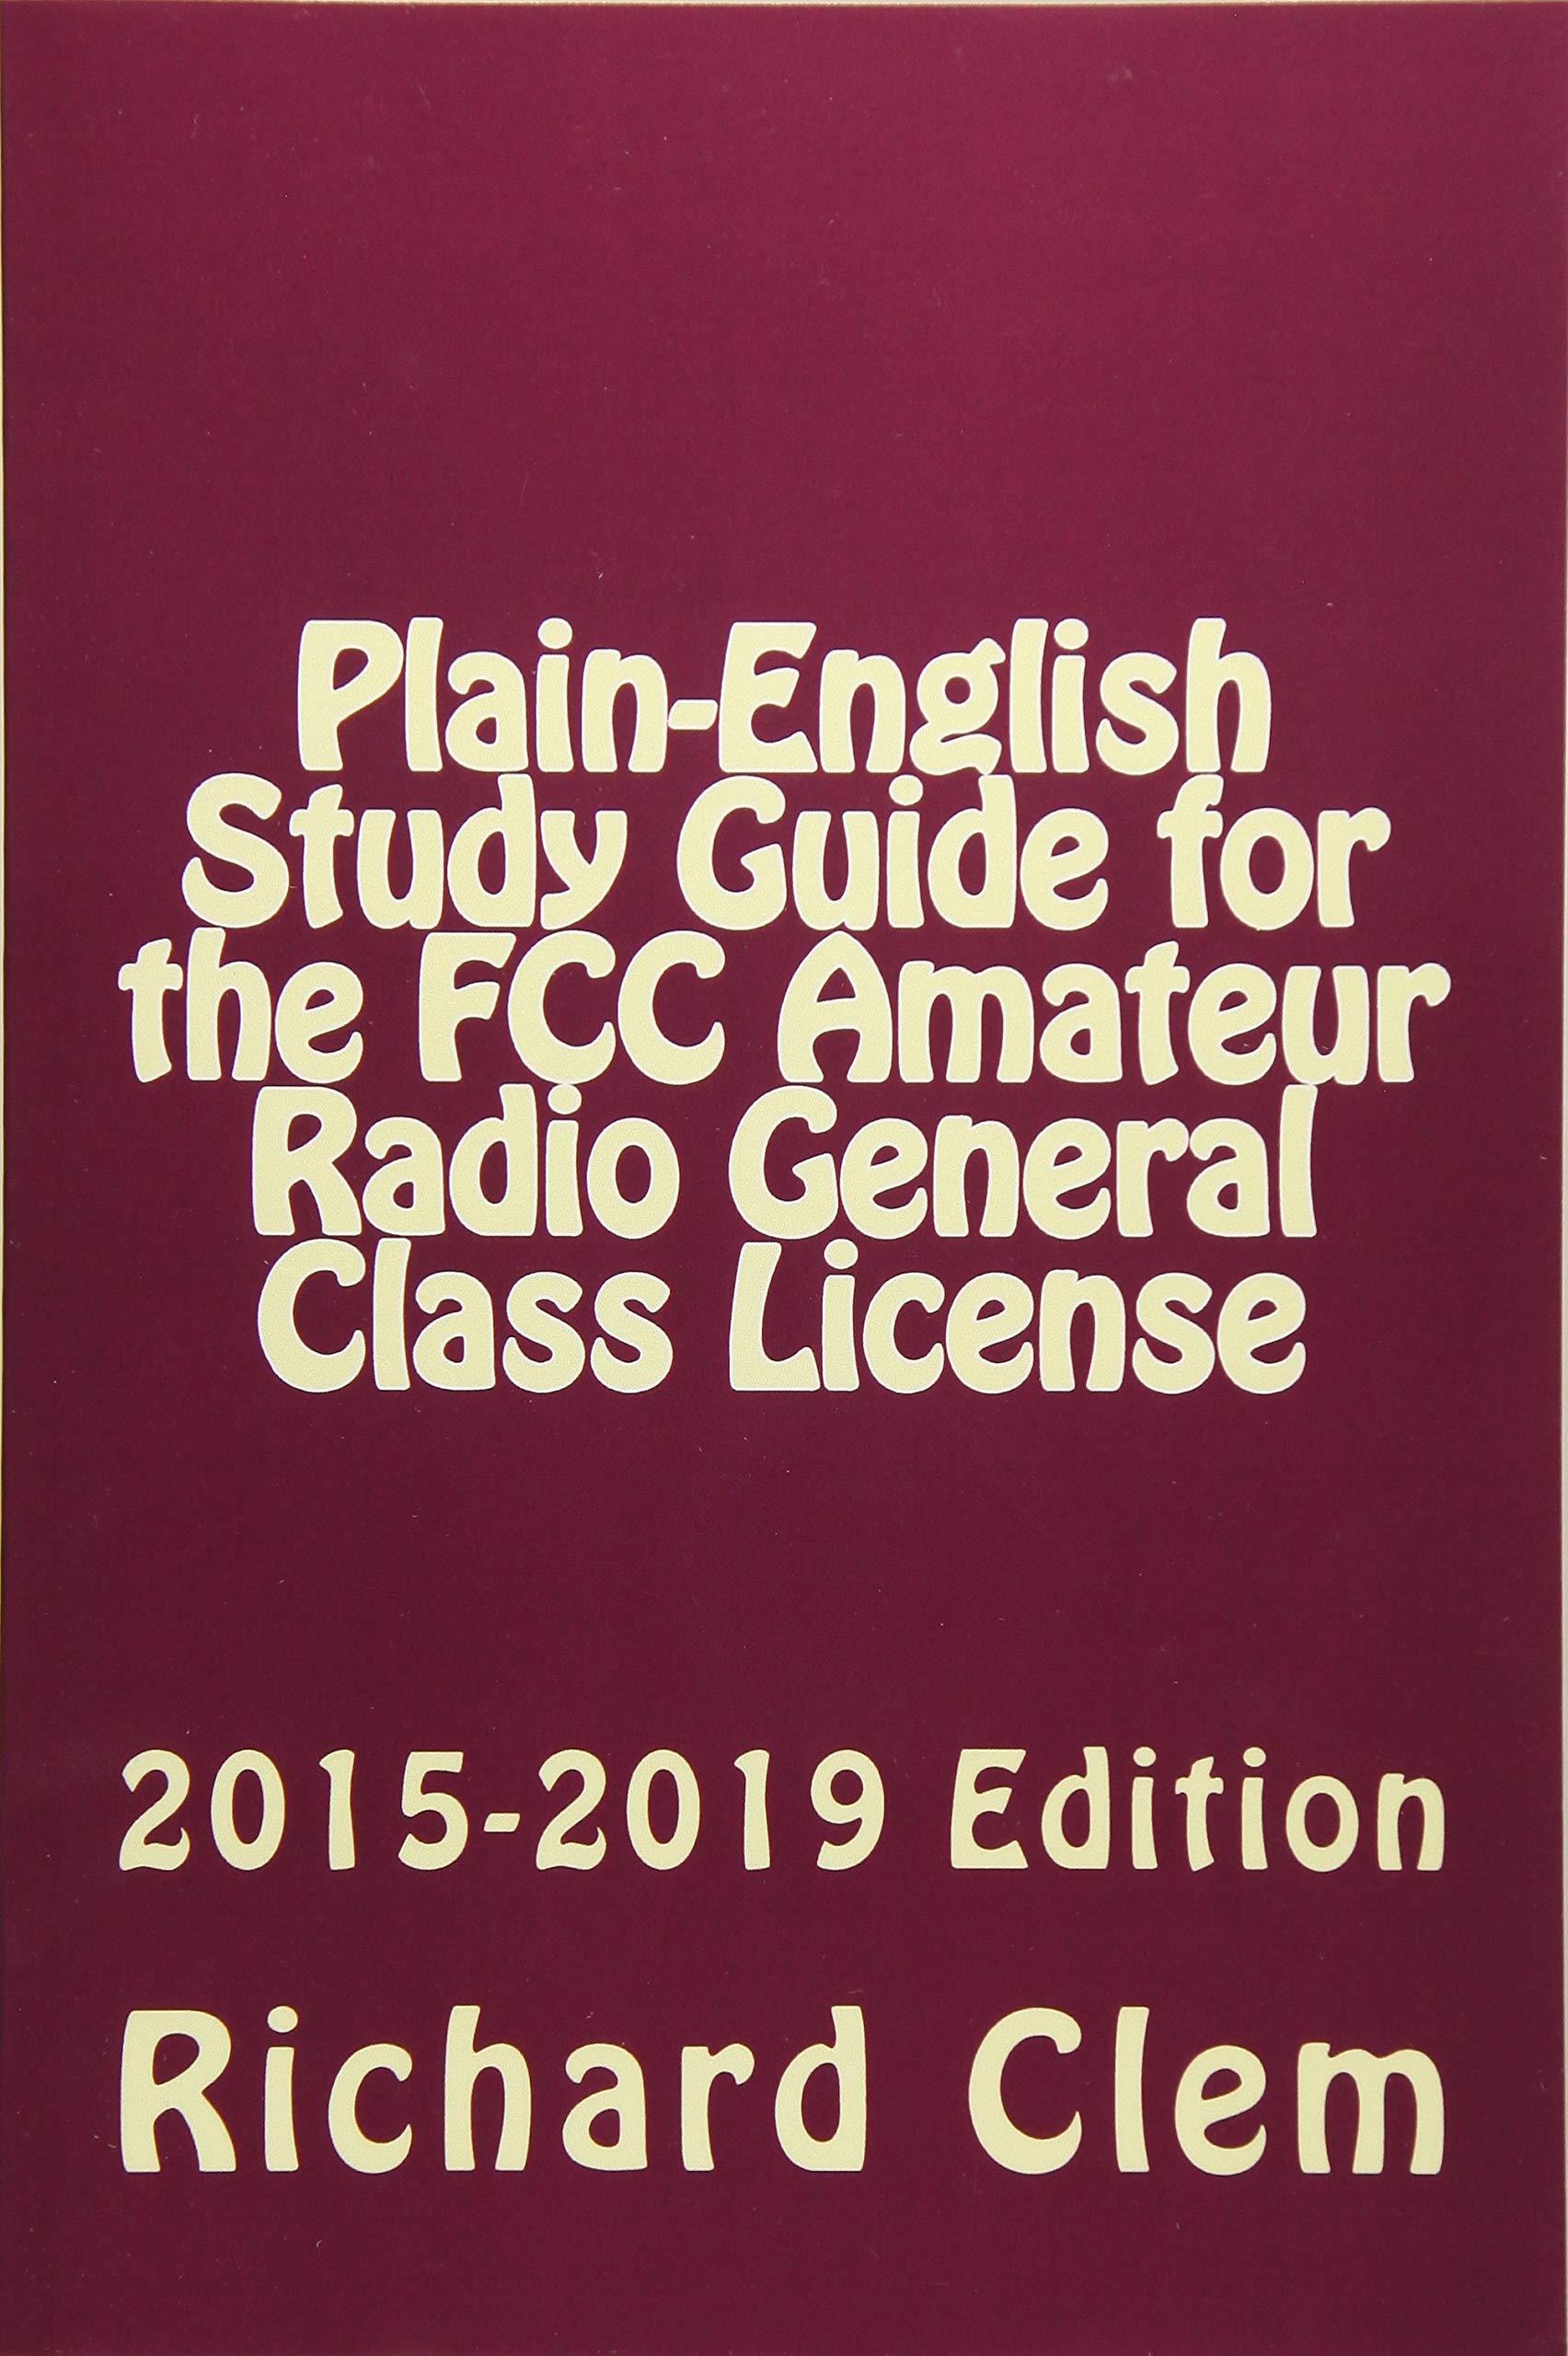 HamRadioSchool.com Technician & General License Course